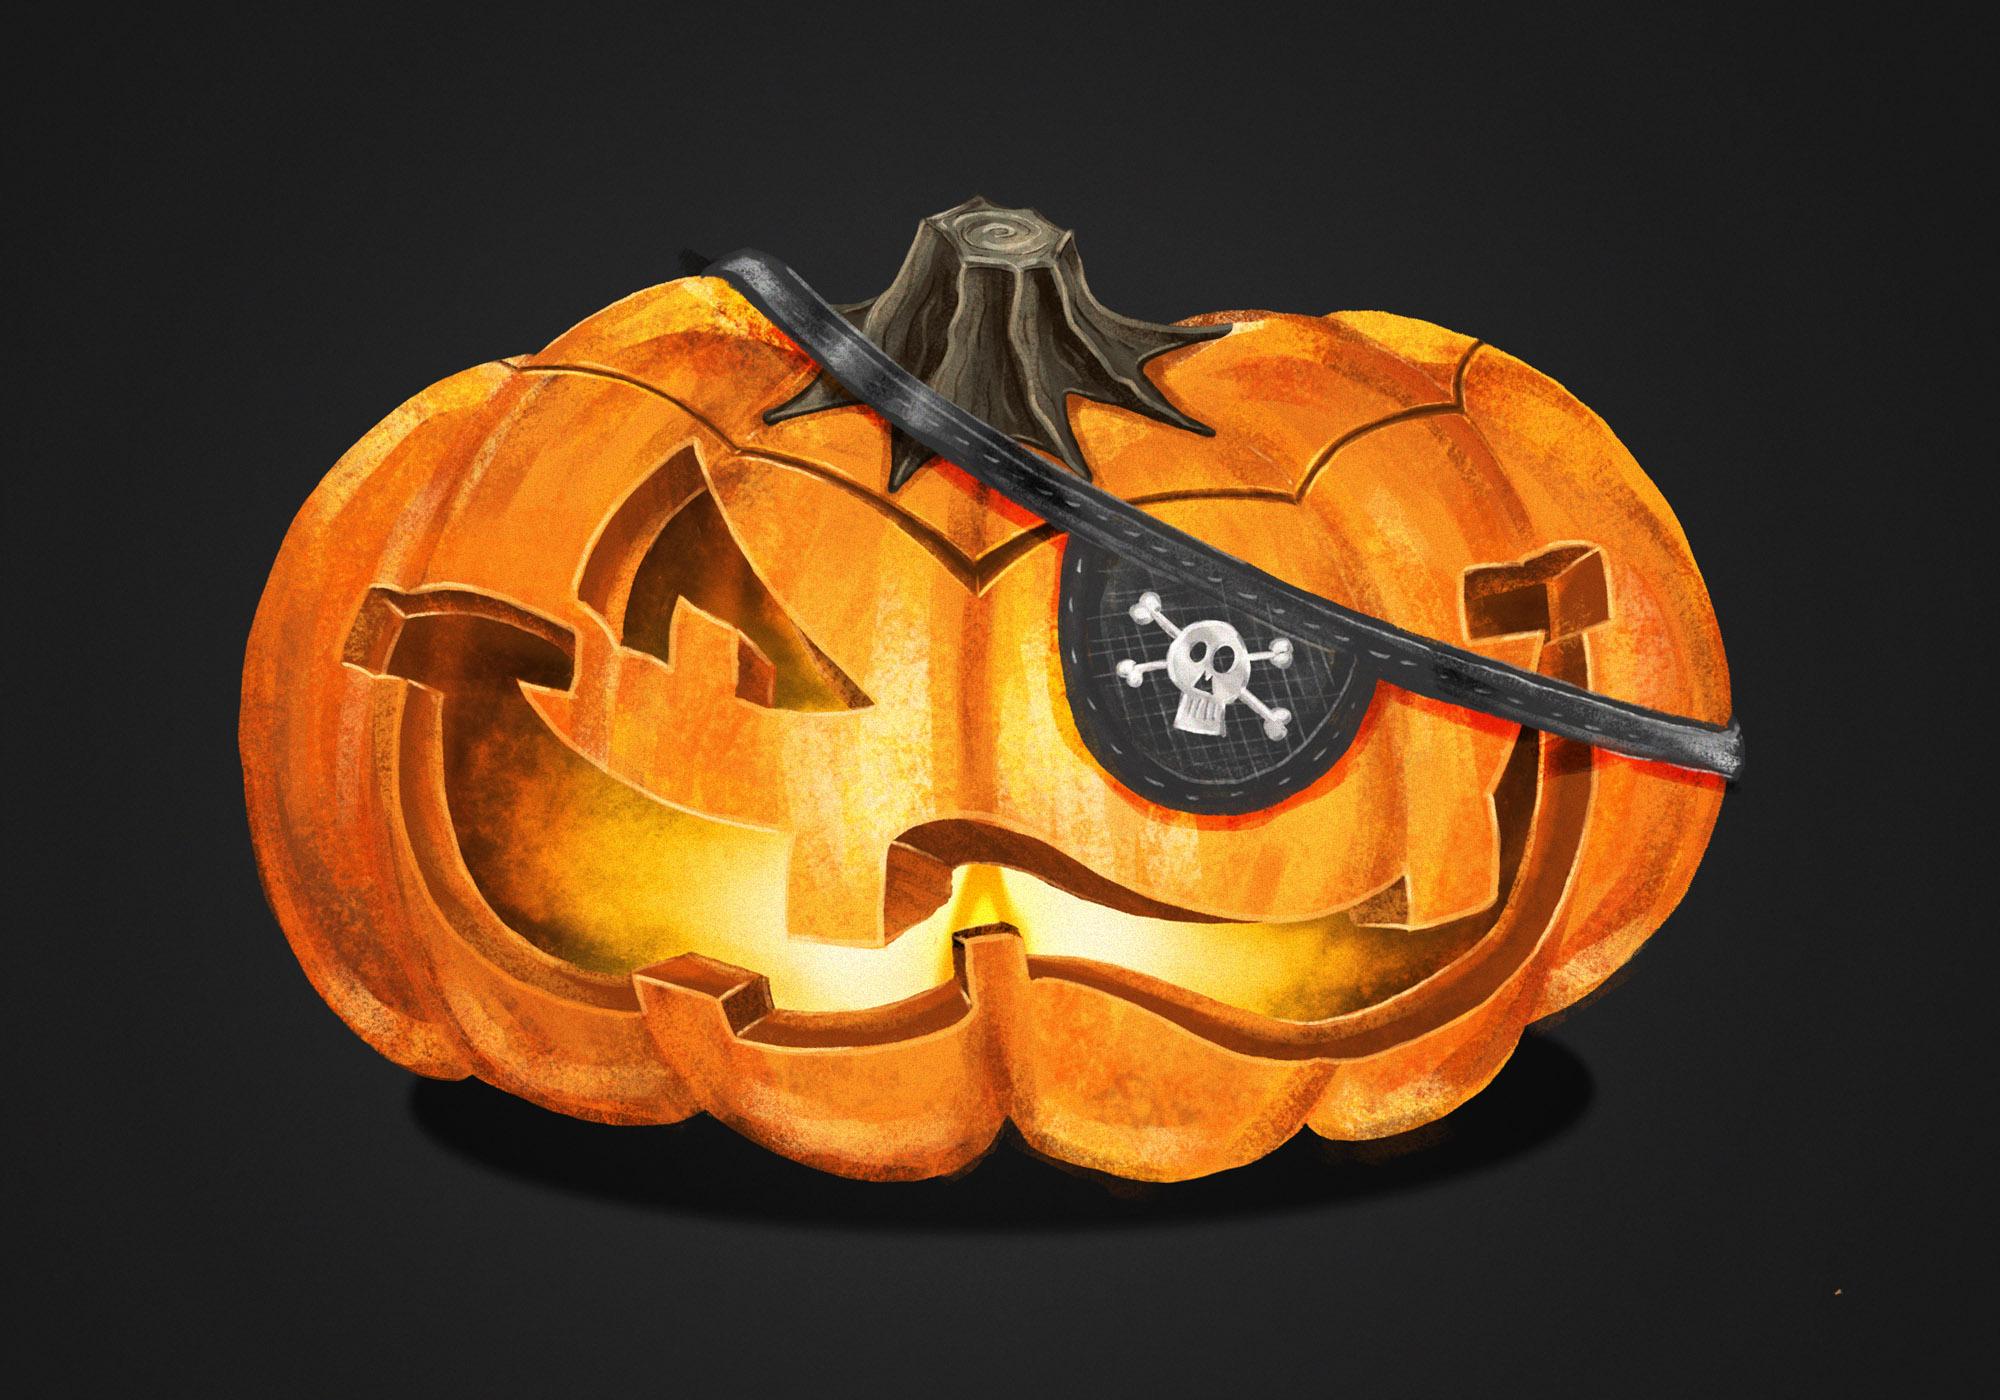 2017-10-08_pumpkin_-_lg